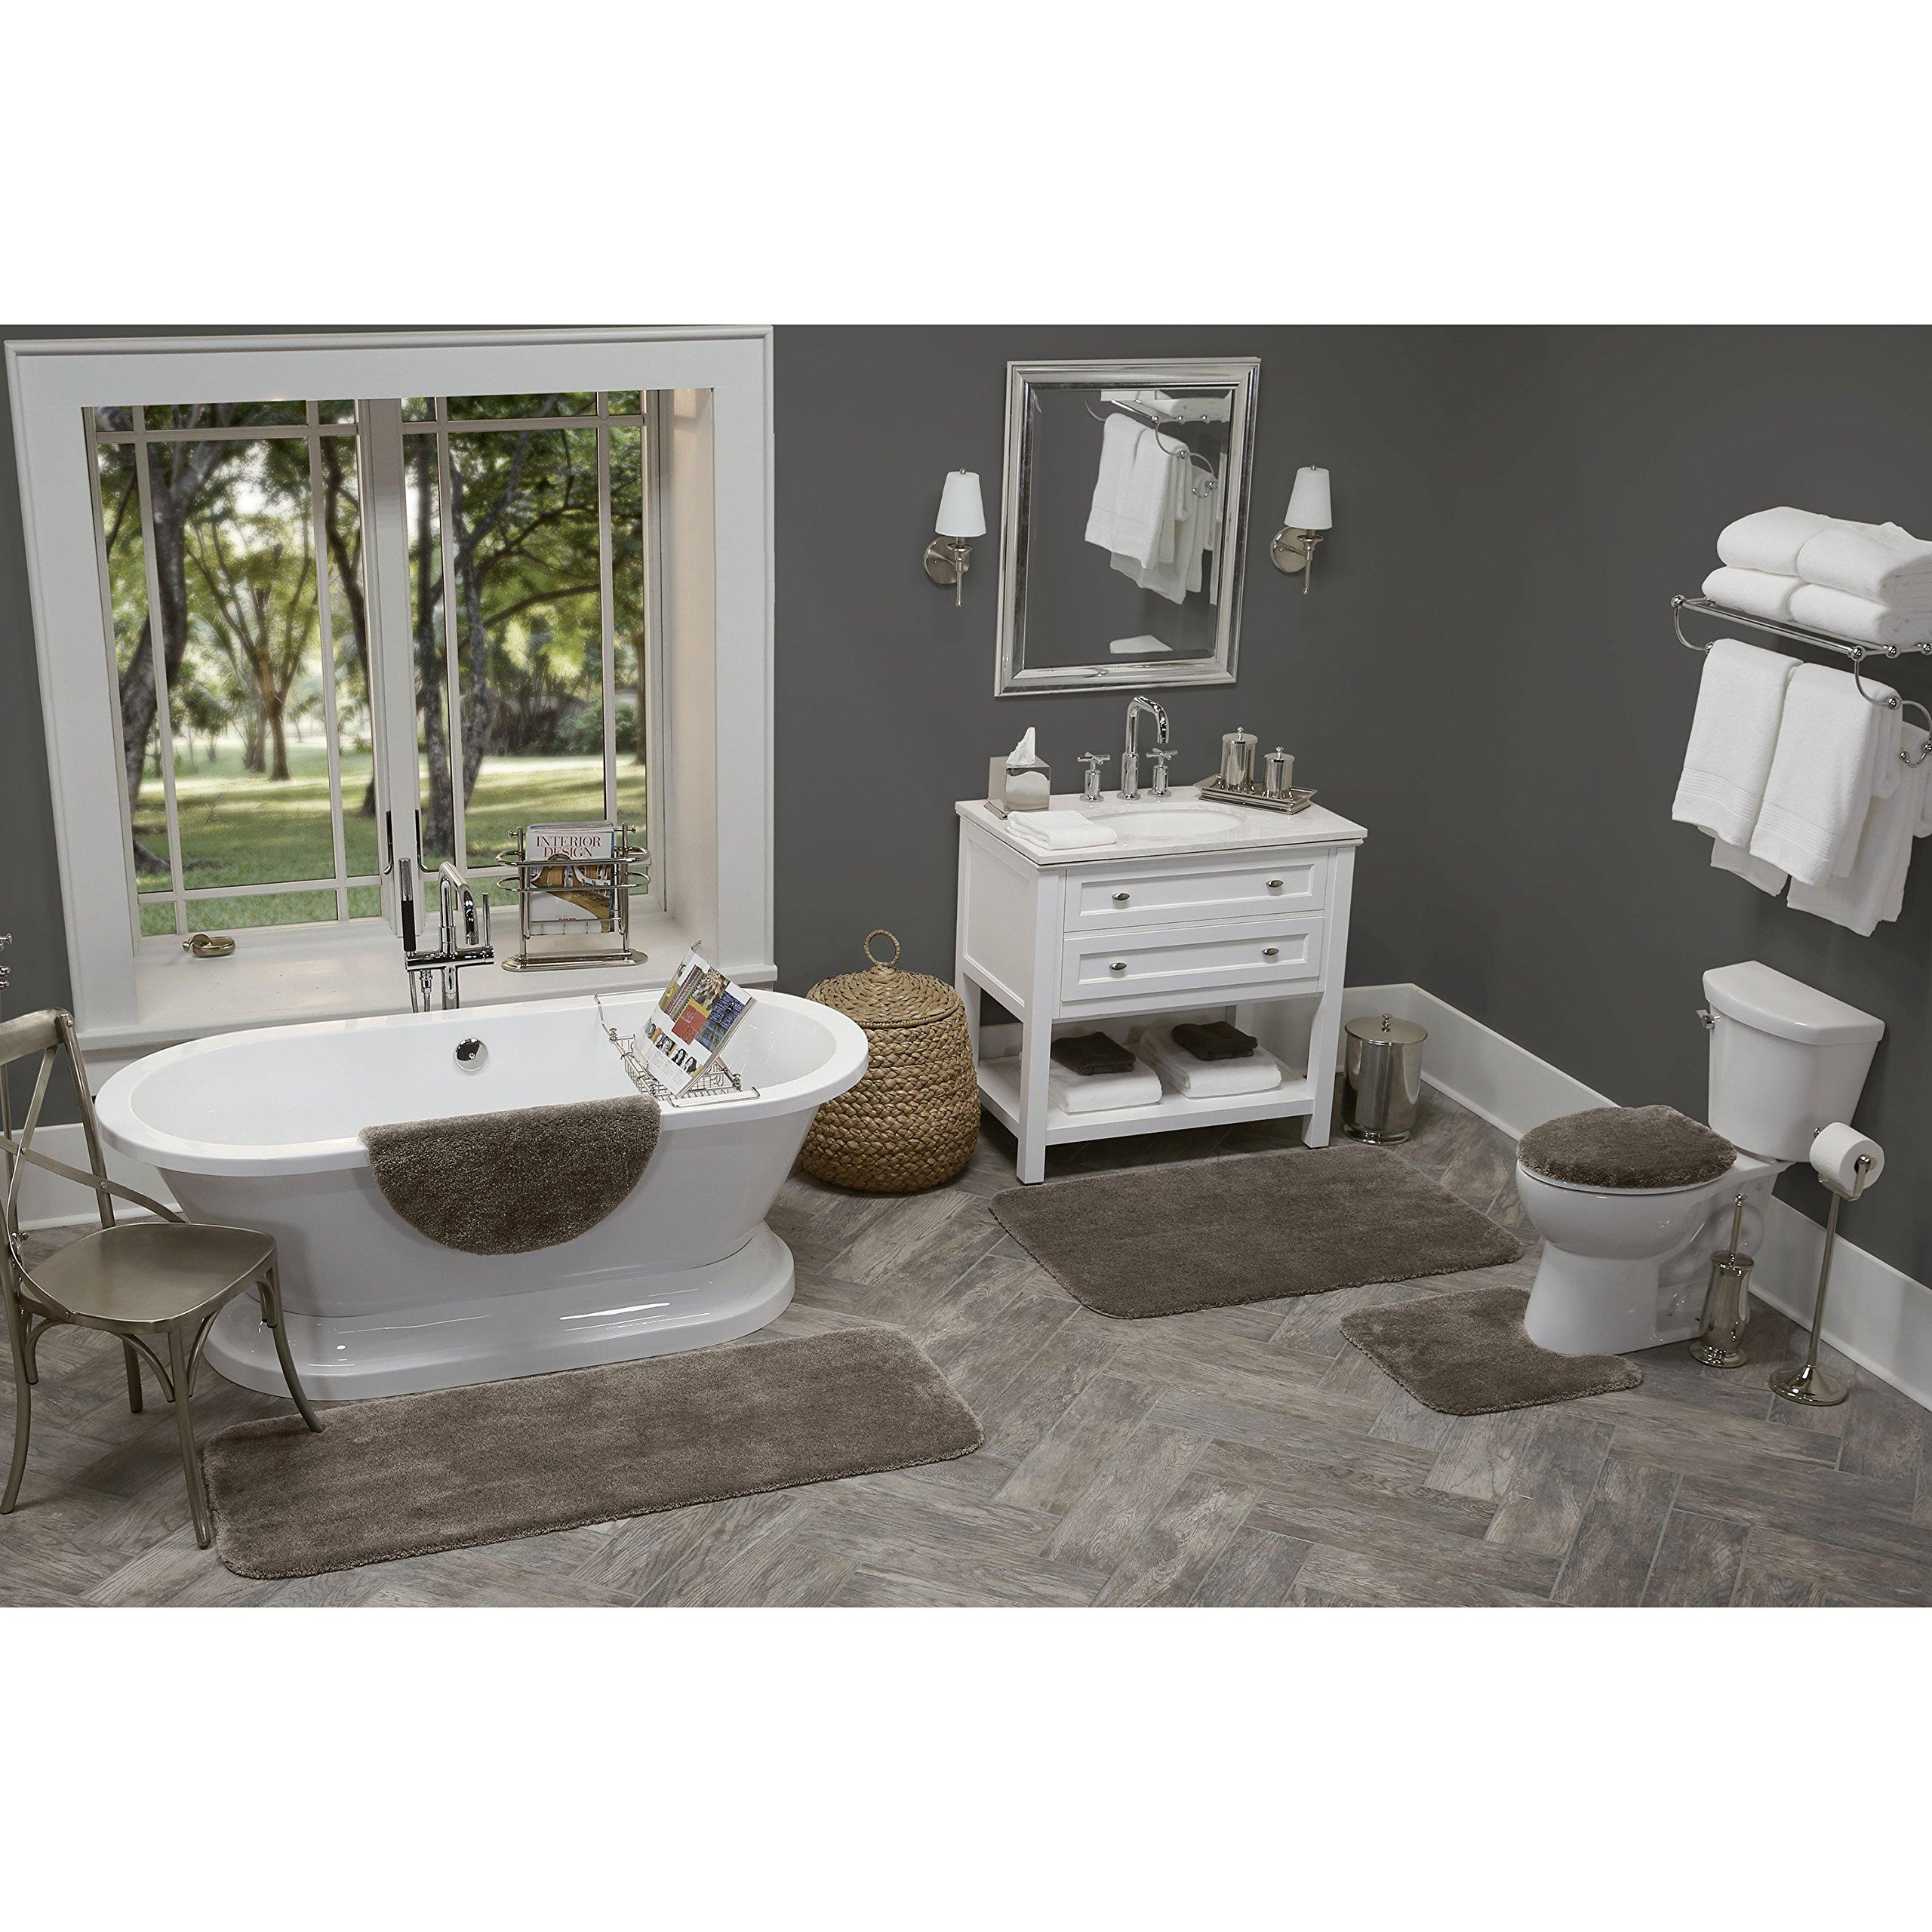 "Maples Rugs Cloud Bath 20"" x 21.5"" Contour Non Slip Toilet Rug [Made in USA] Machine Washable Soft Bath Mat, Mocha Latte"